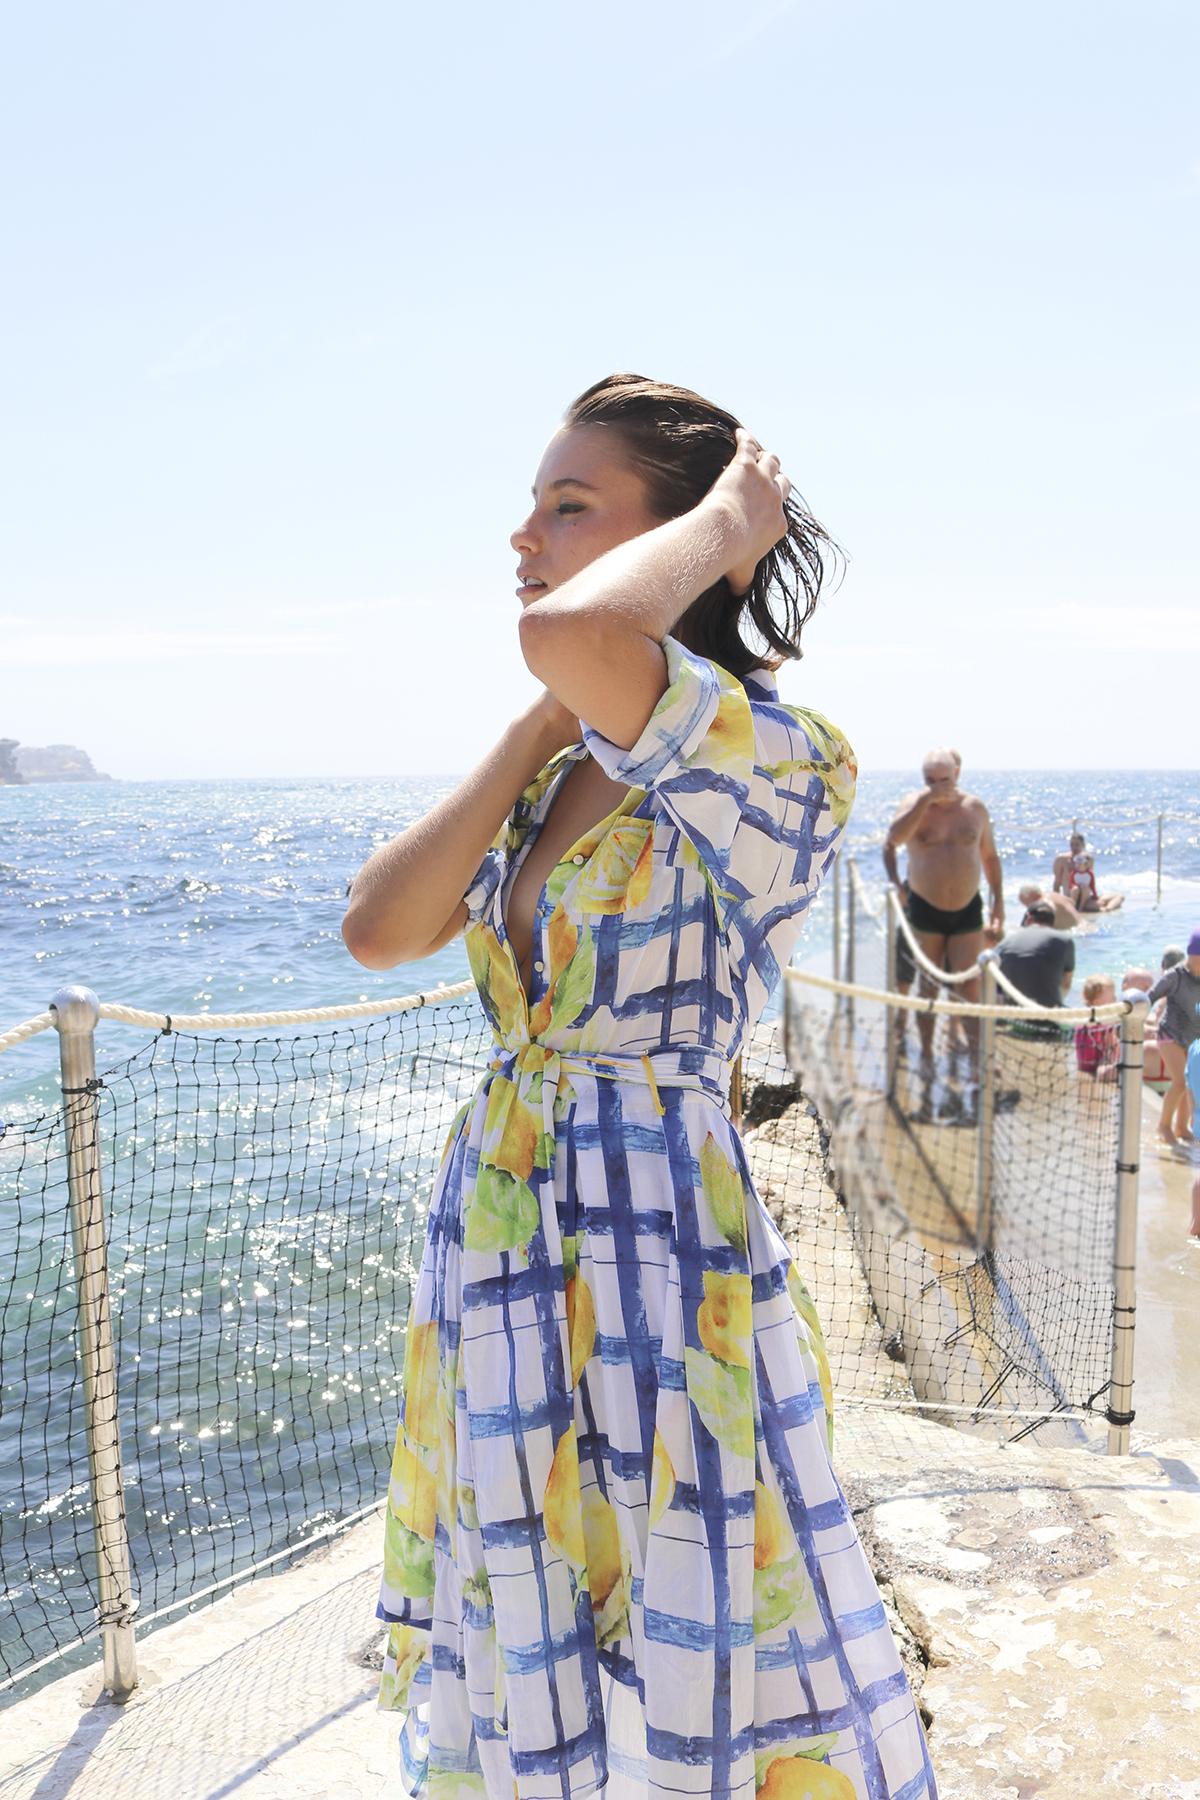 aje-britt-odell-insider-blog-model-priscillas-denim-dress-summer-bronte-beach-ausrtalia-12-online.jpg